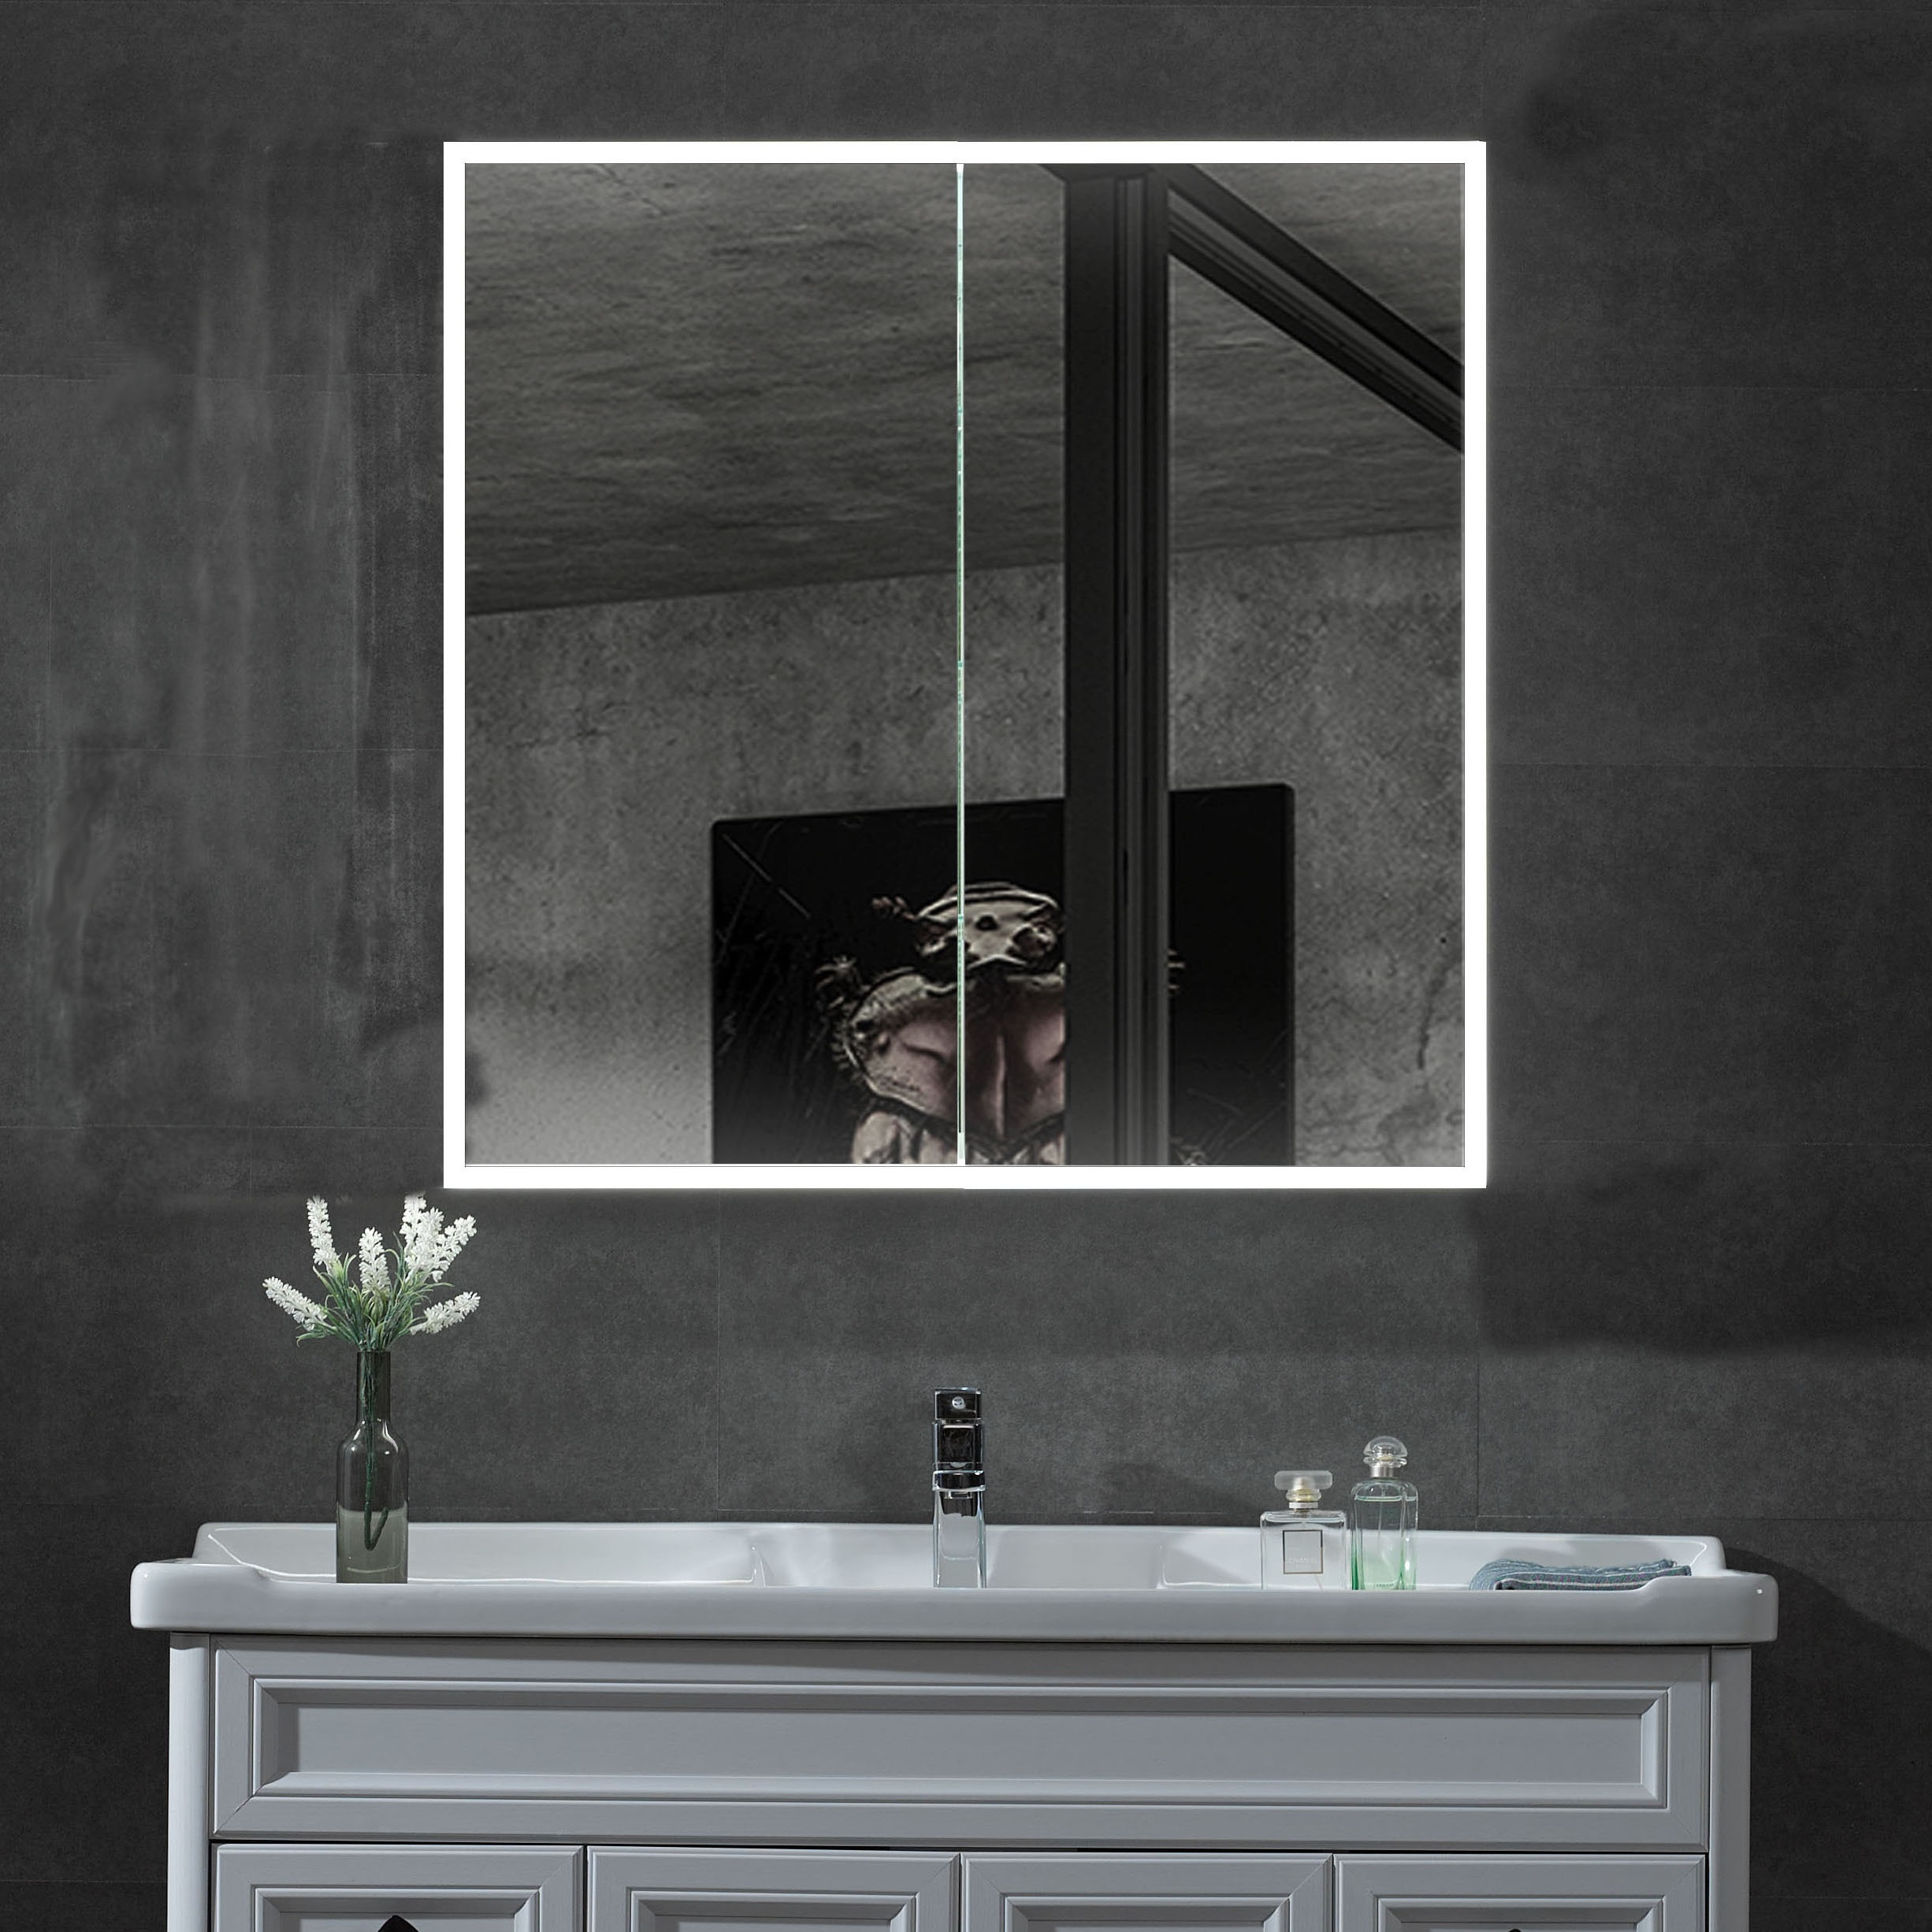 ALFI ABMC3630 36 x 30 in. Double Door LED Light Medicine Cabinet, Grey